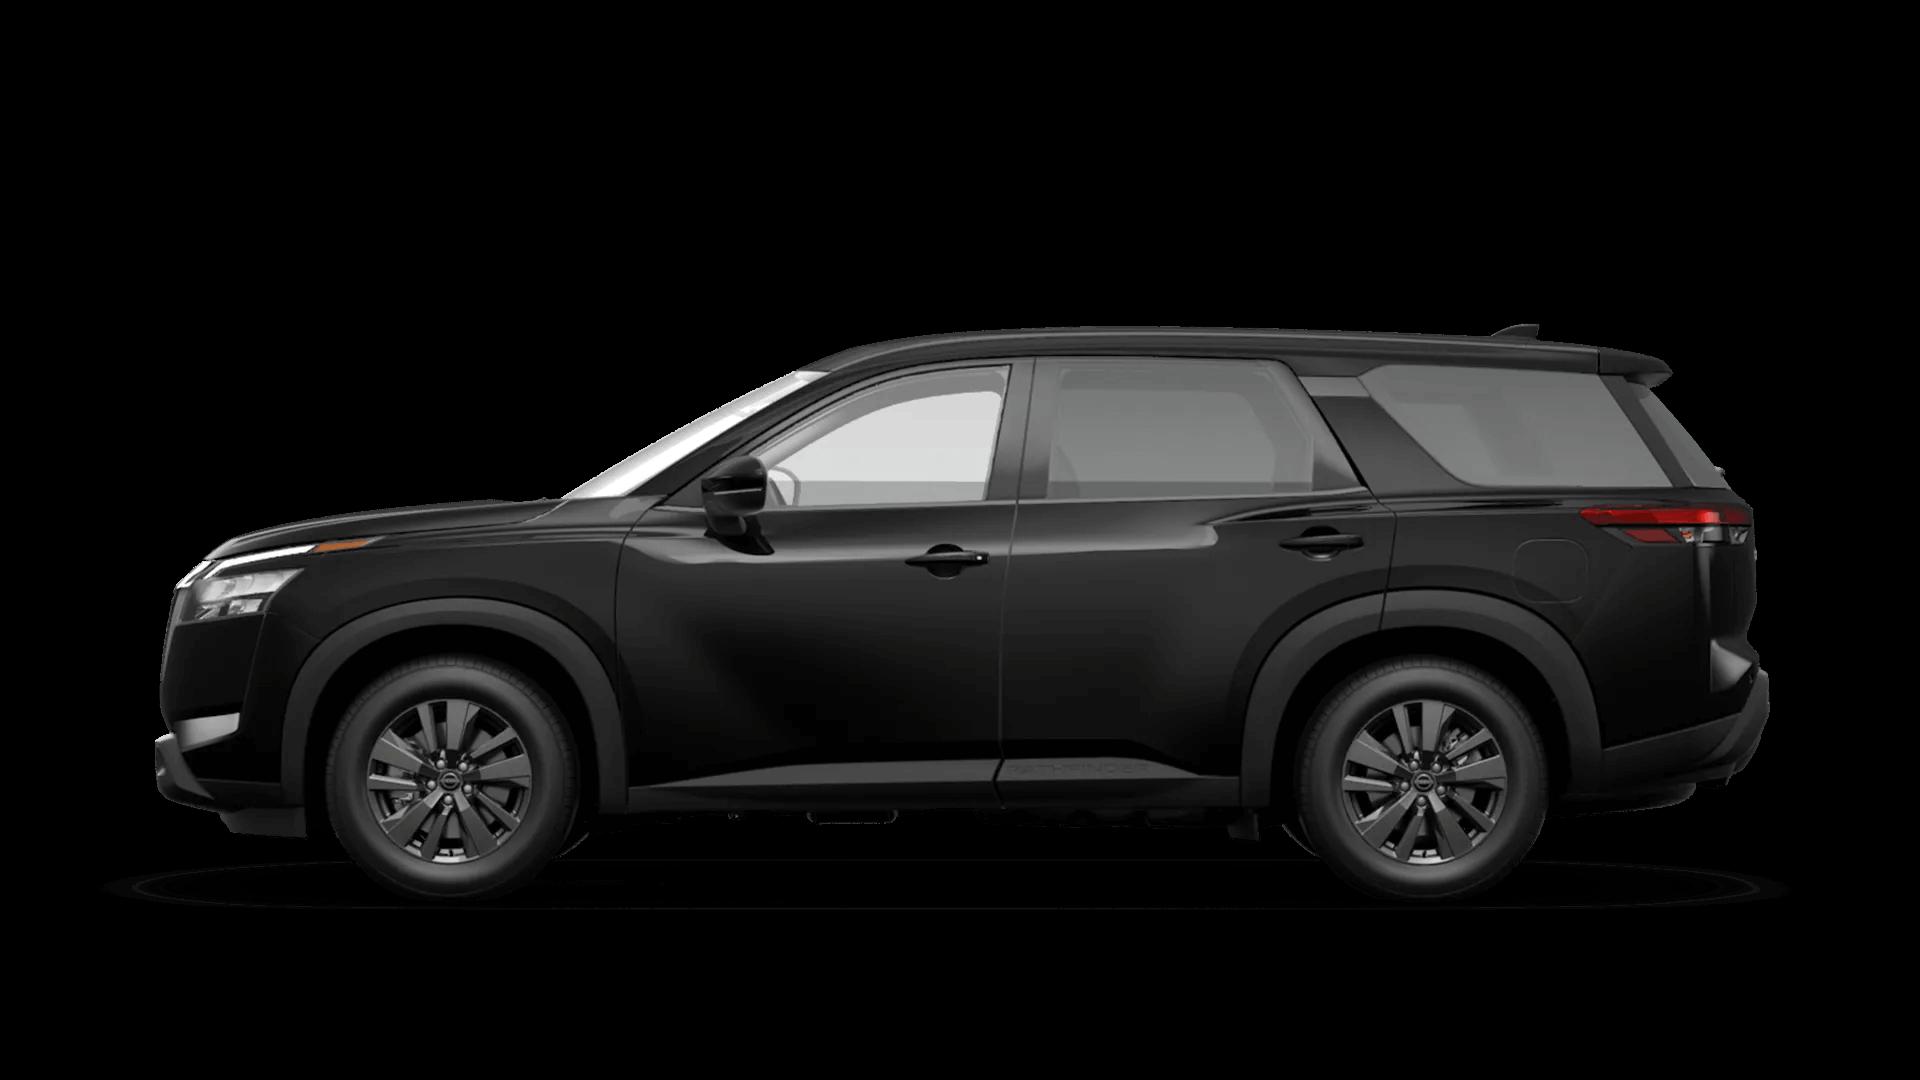 2022 Pathfinder® S 4WD in Super Black